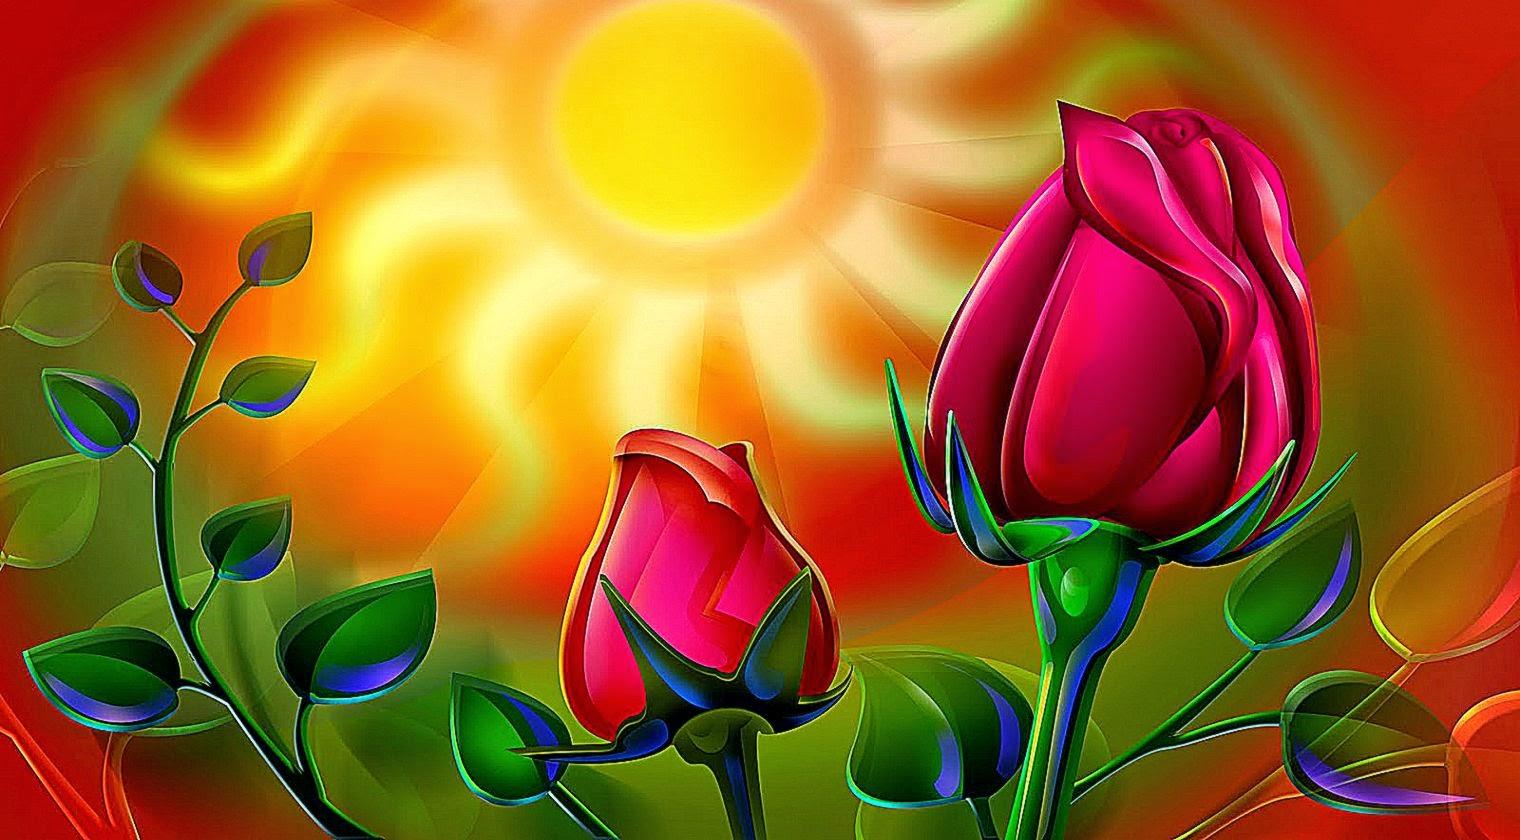 3d rose flower wallpaper | wallpaper background gallery